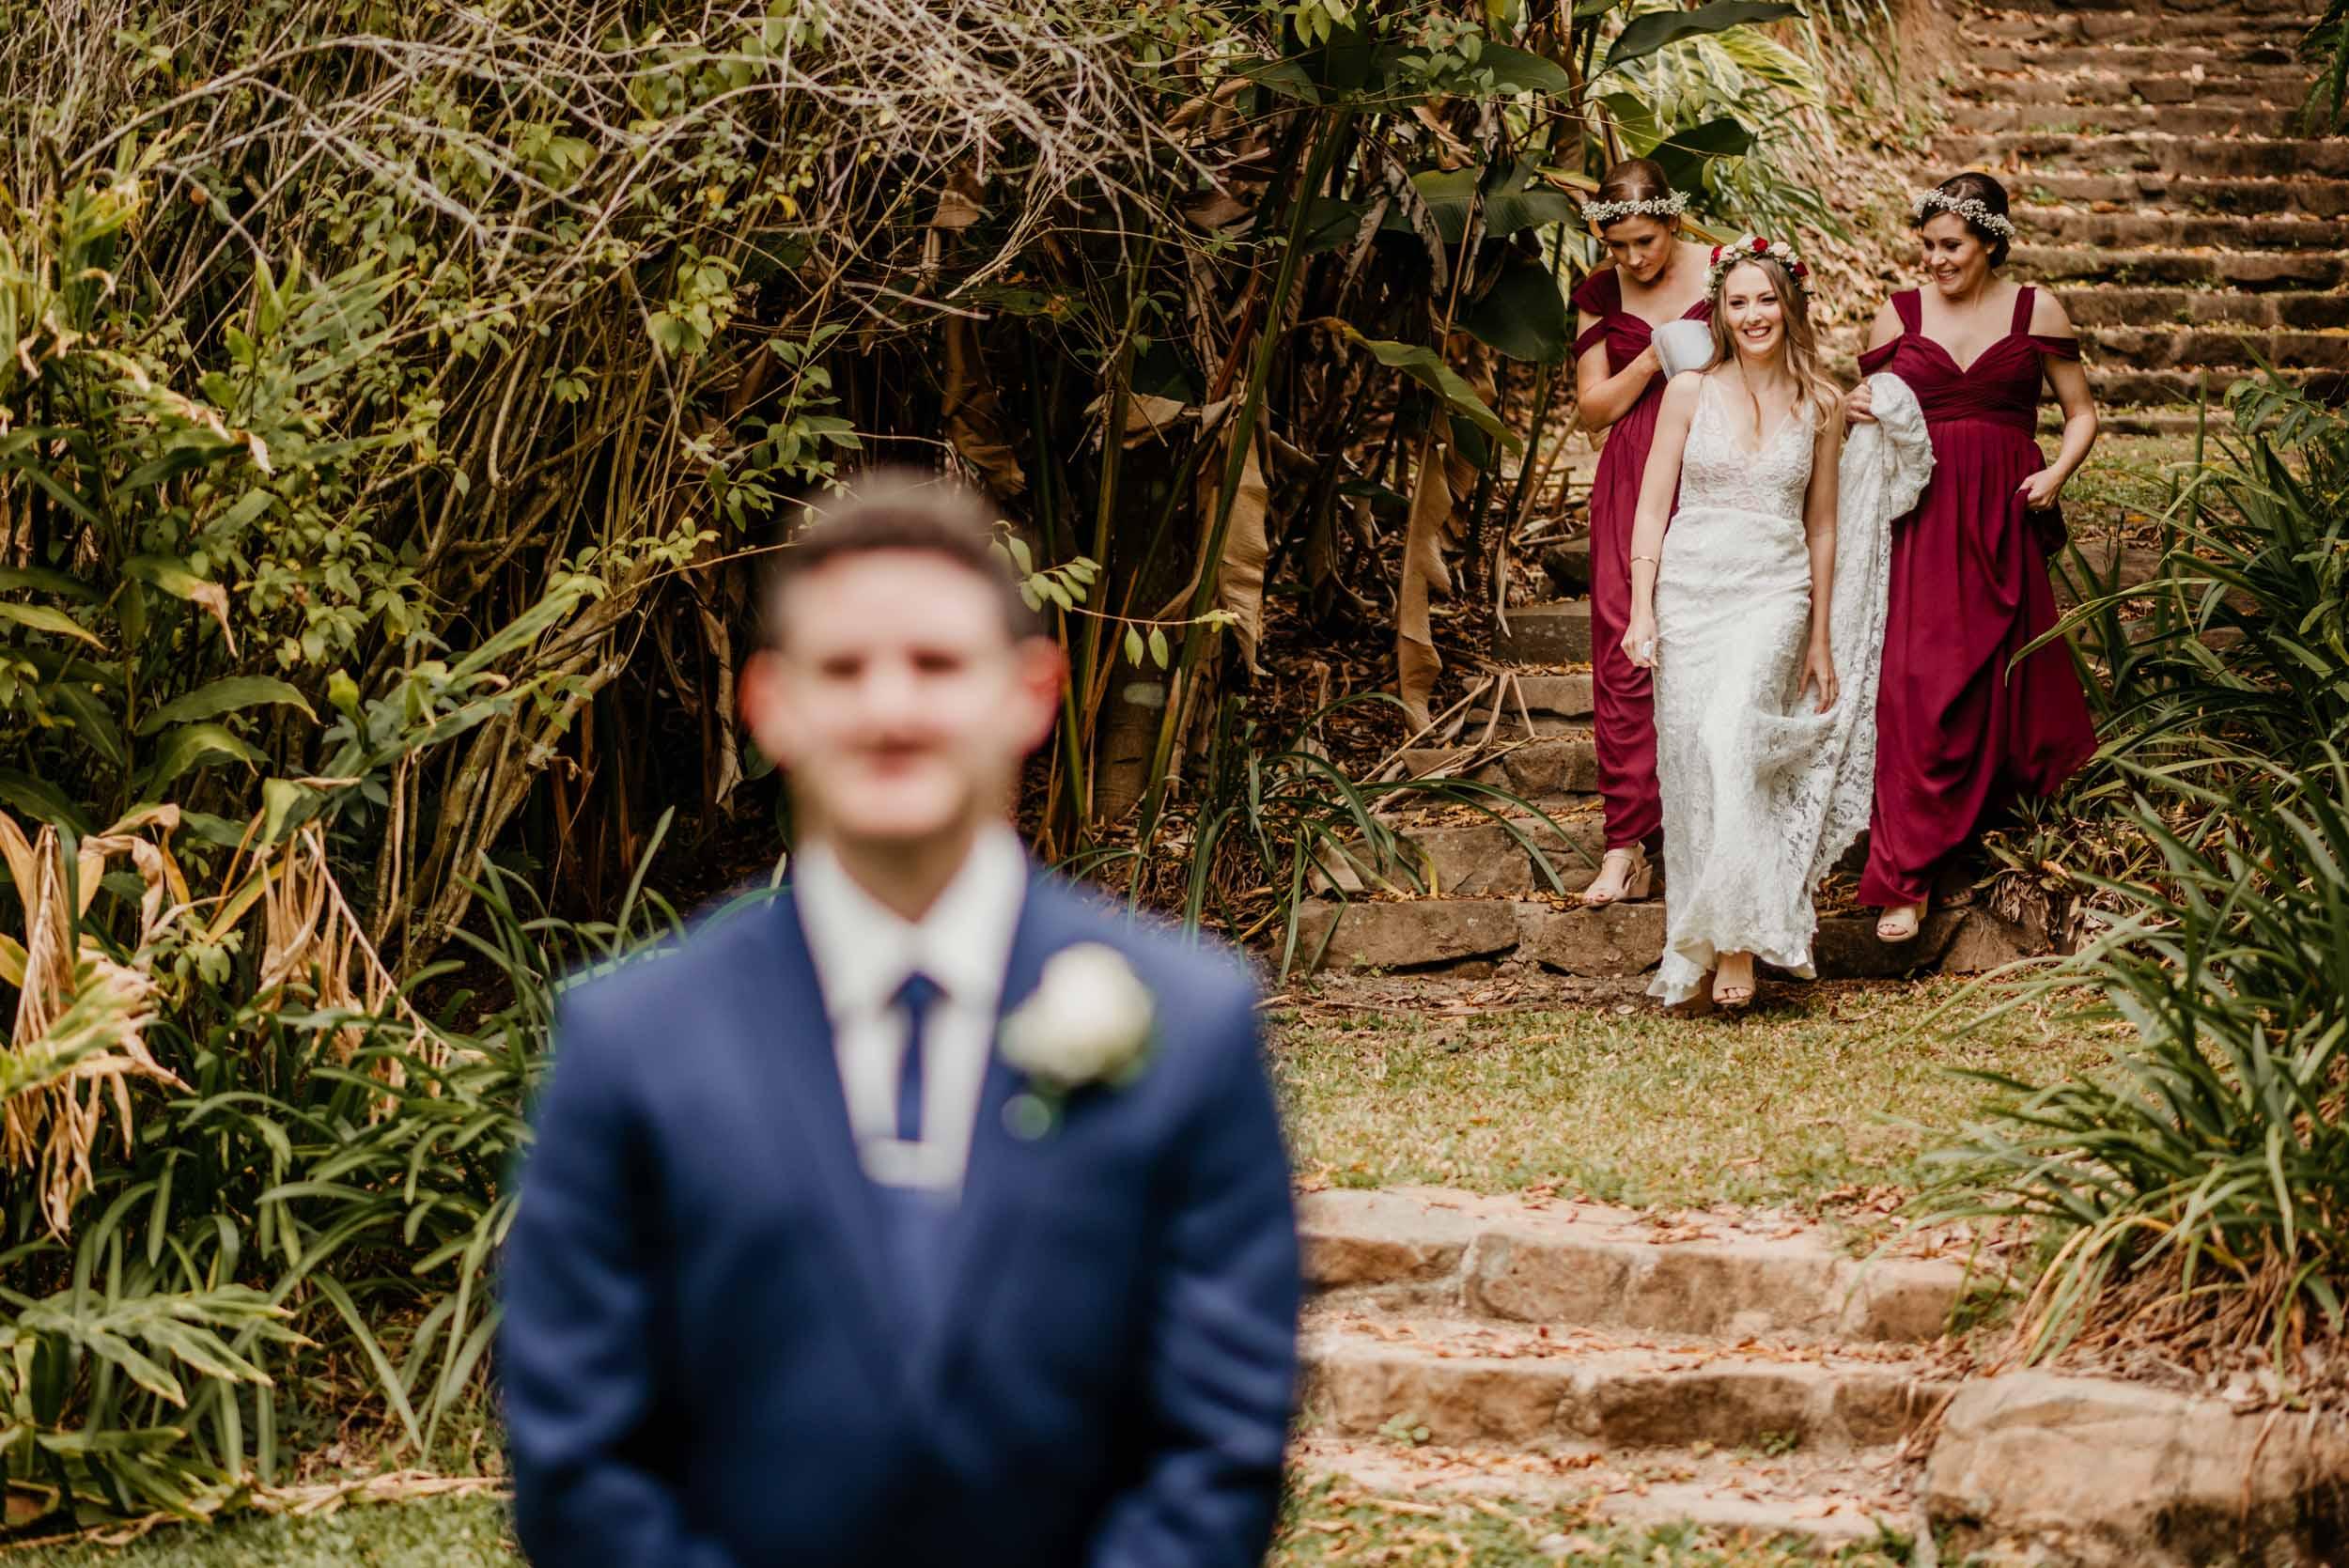 The Raw Photographer - Cairns Wedding Photographer - Laloli - Cairns Garden Ceremony - Cane Fields Photo Shoot-22.jpg